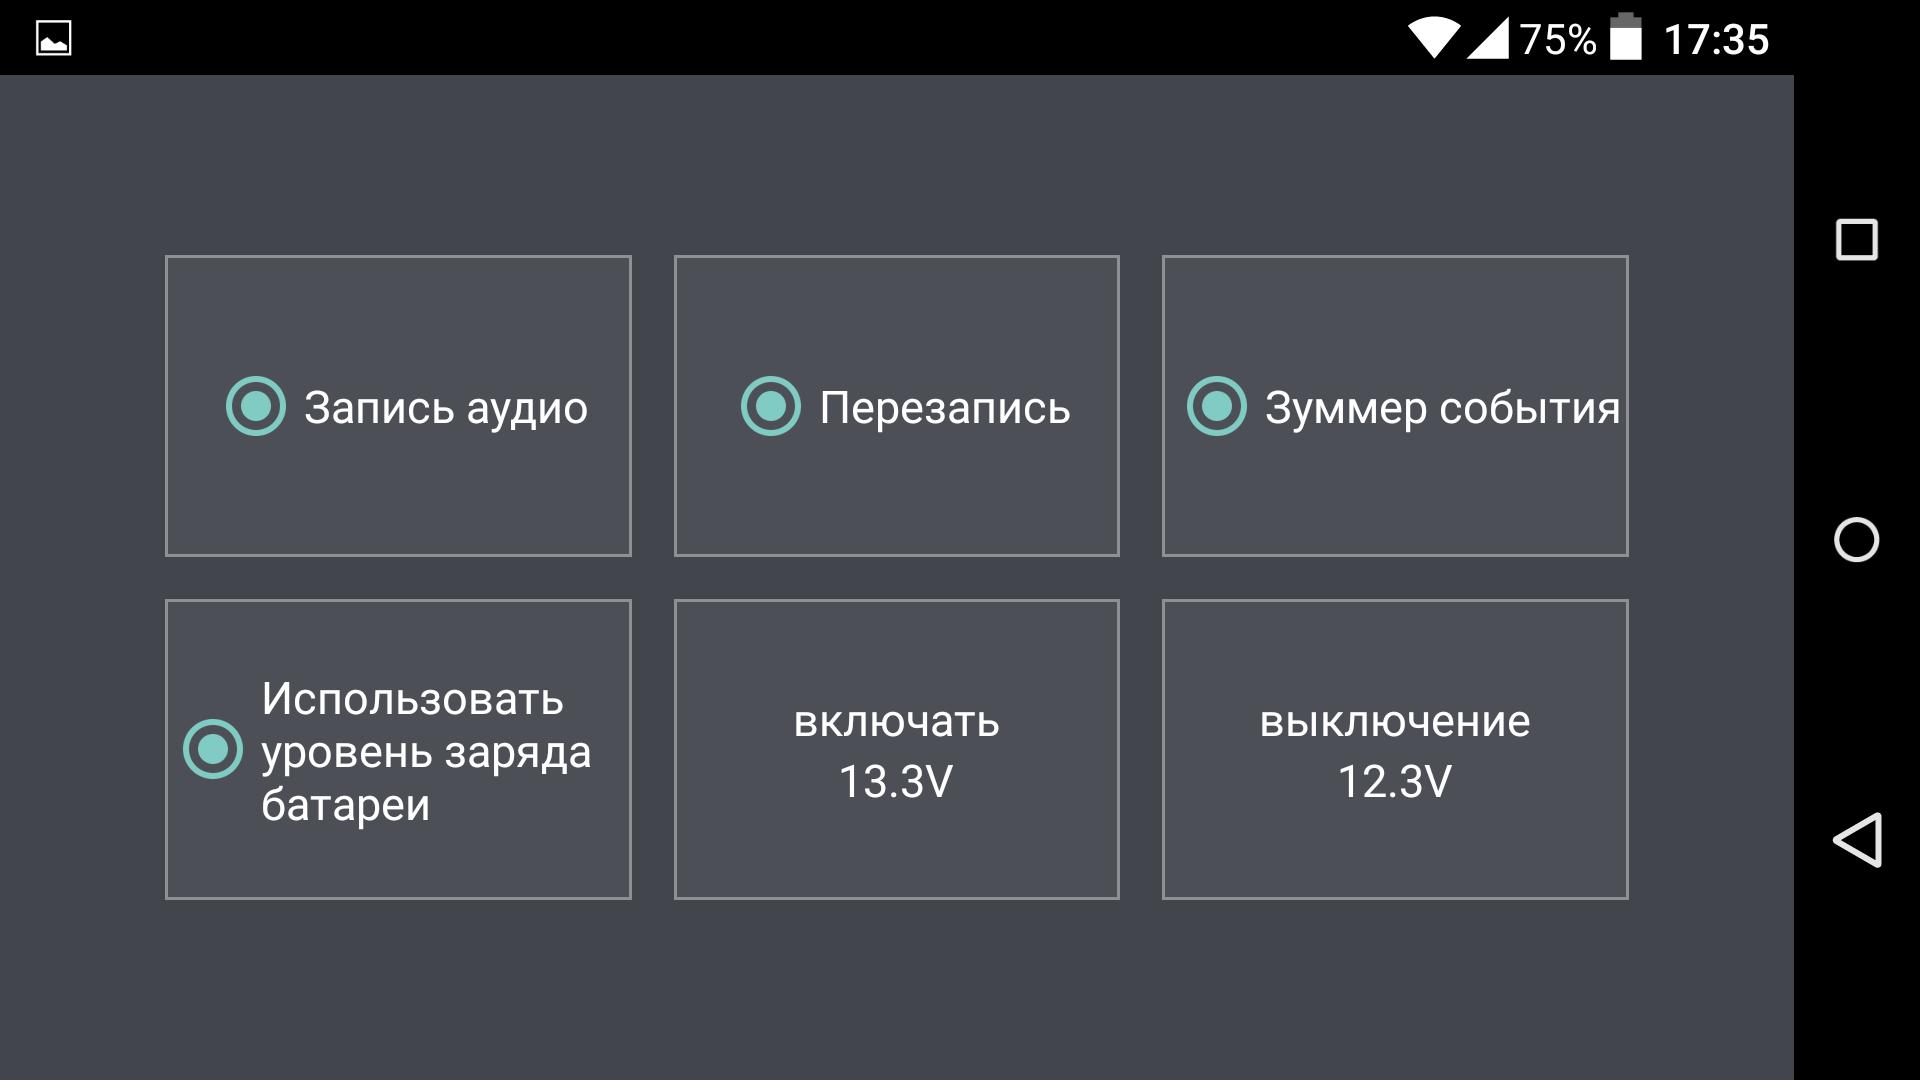 Screenshot_2016-02-10-17-35-15.png